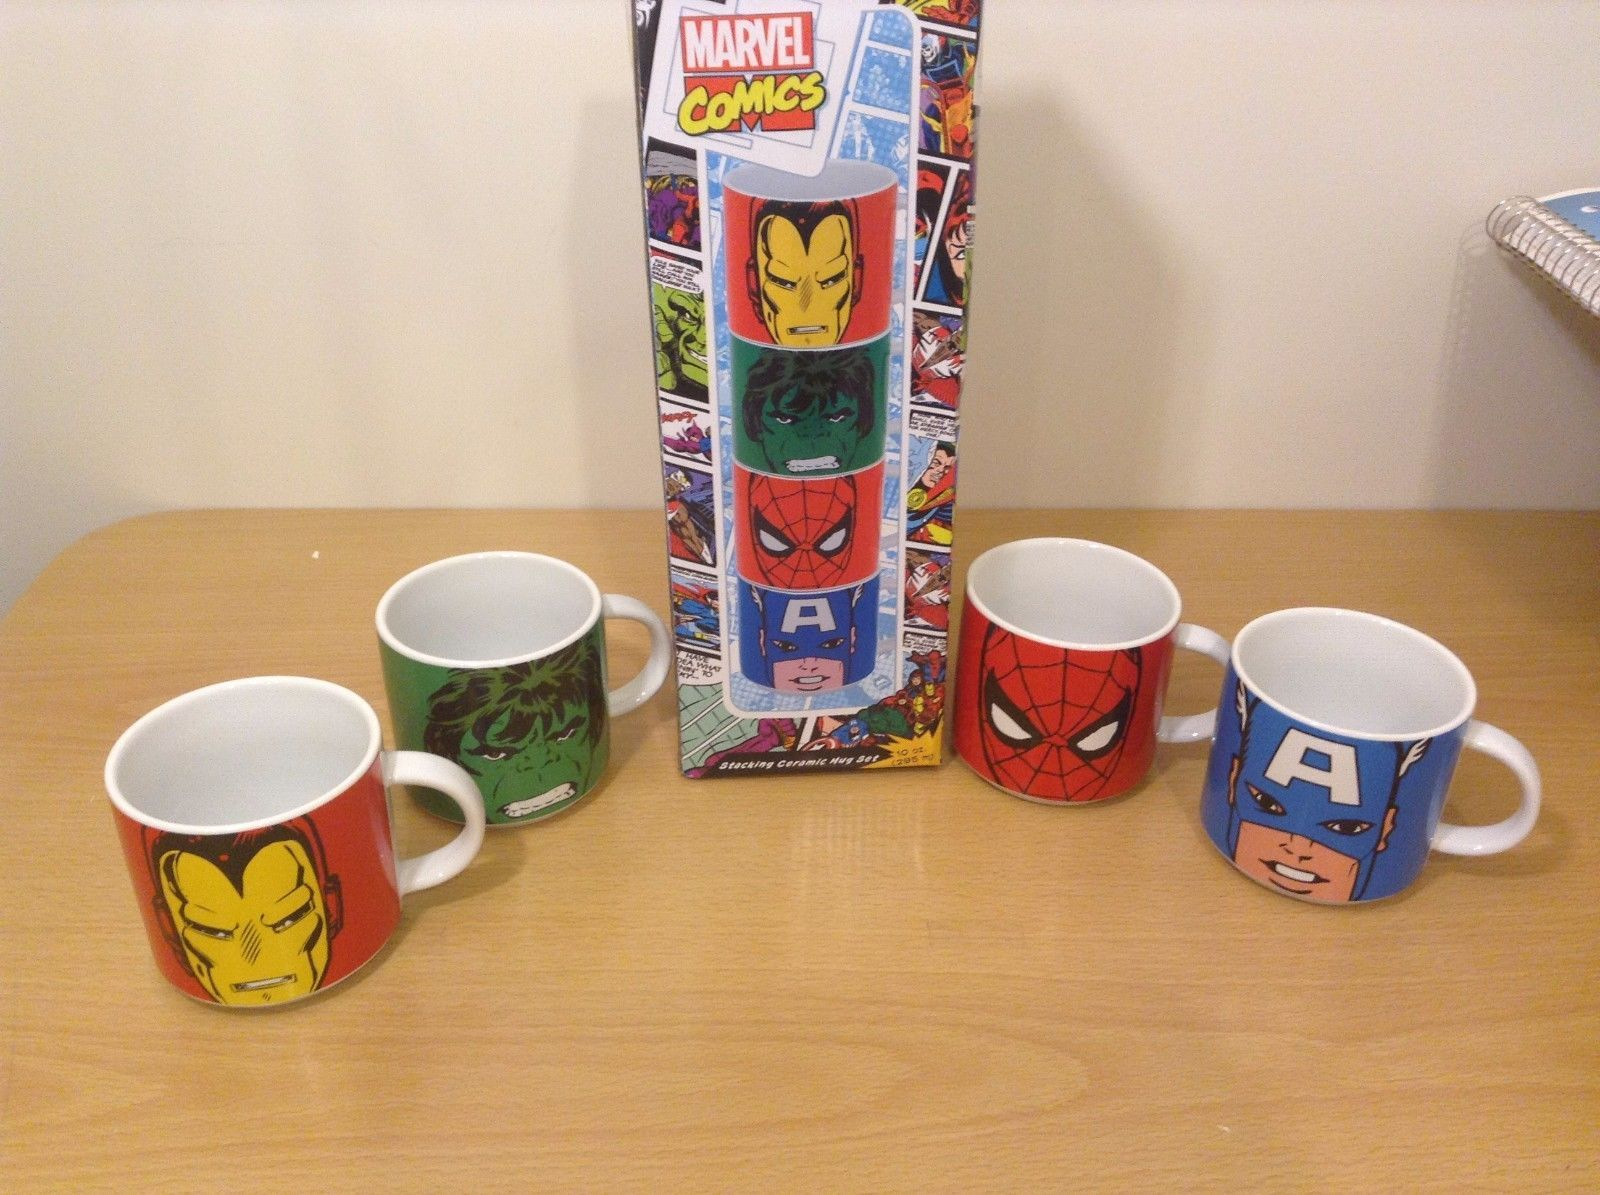 Marvel 4 Piece Stacking Ceramic Mug Set Iron Man Hulk Spiderman Captain America